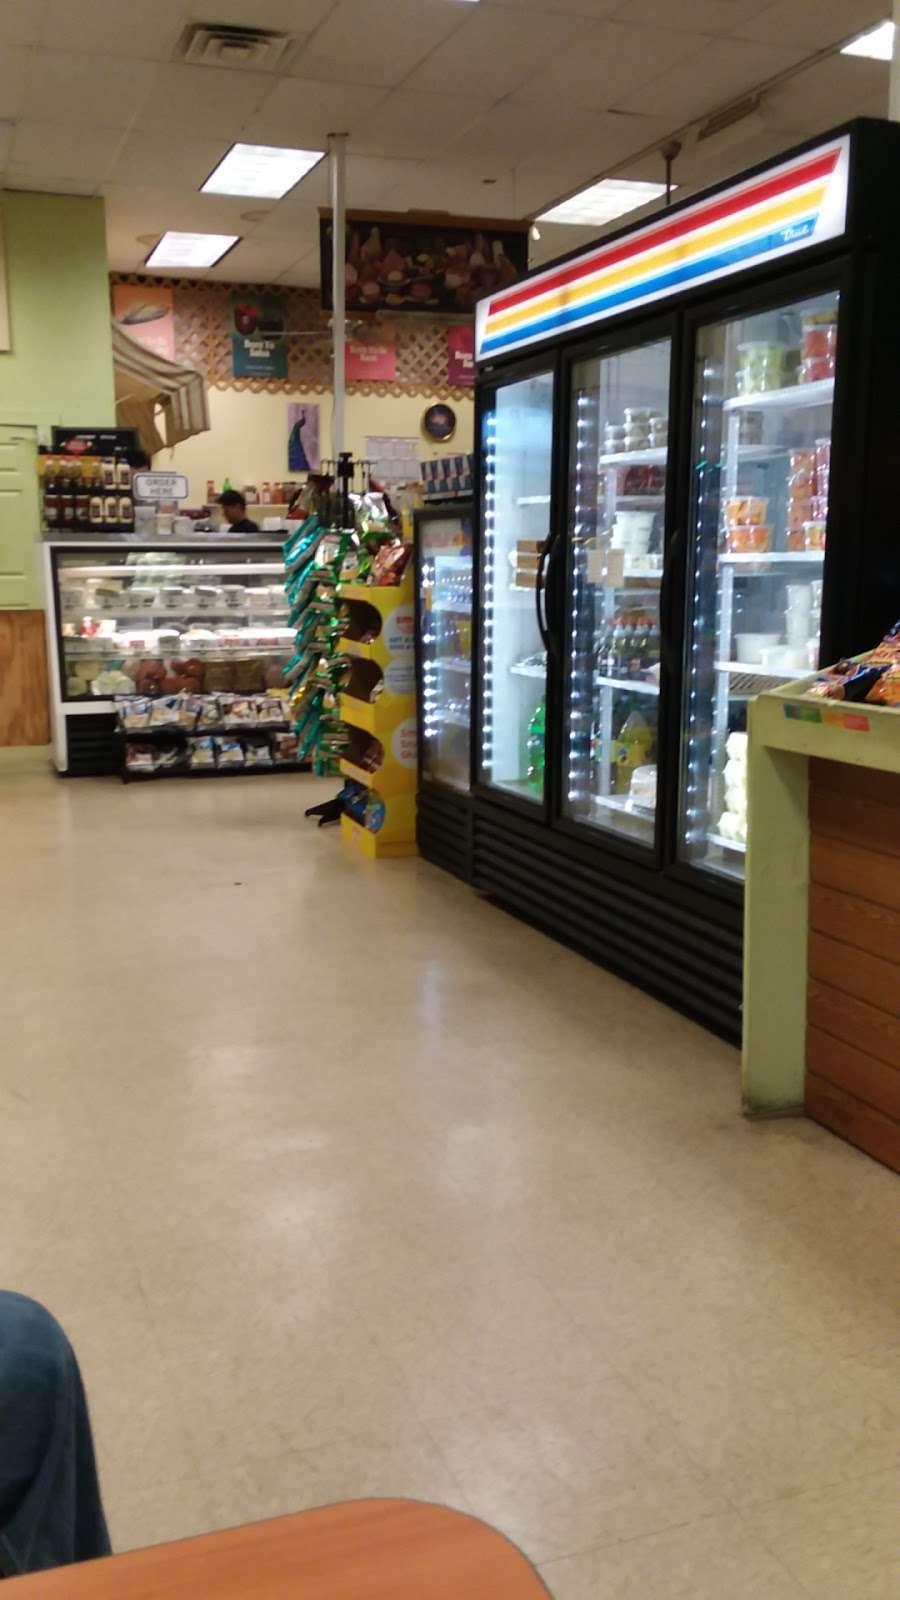 Jersey Jerrys - store    Photo 5 of 10   Address: 1362 S Delsea Dr, Vineland, NJ 08360, USA   Phone: (856) 362-5978